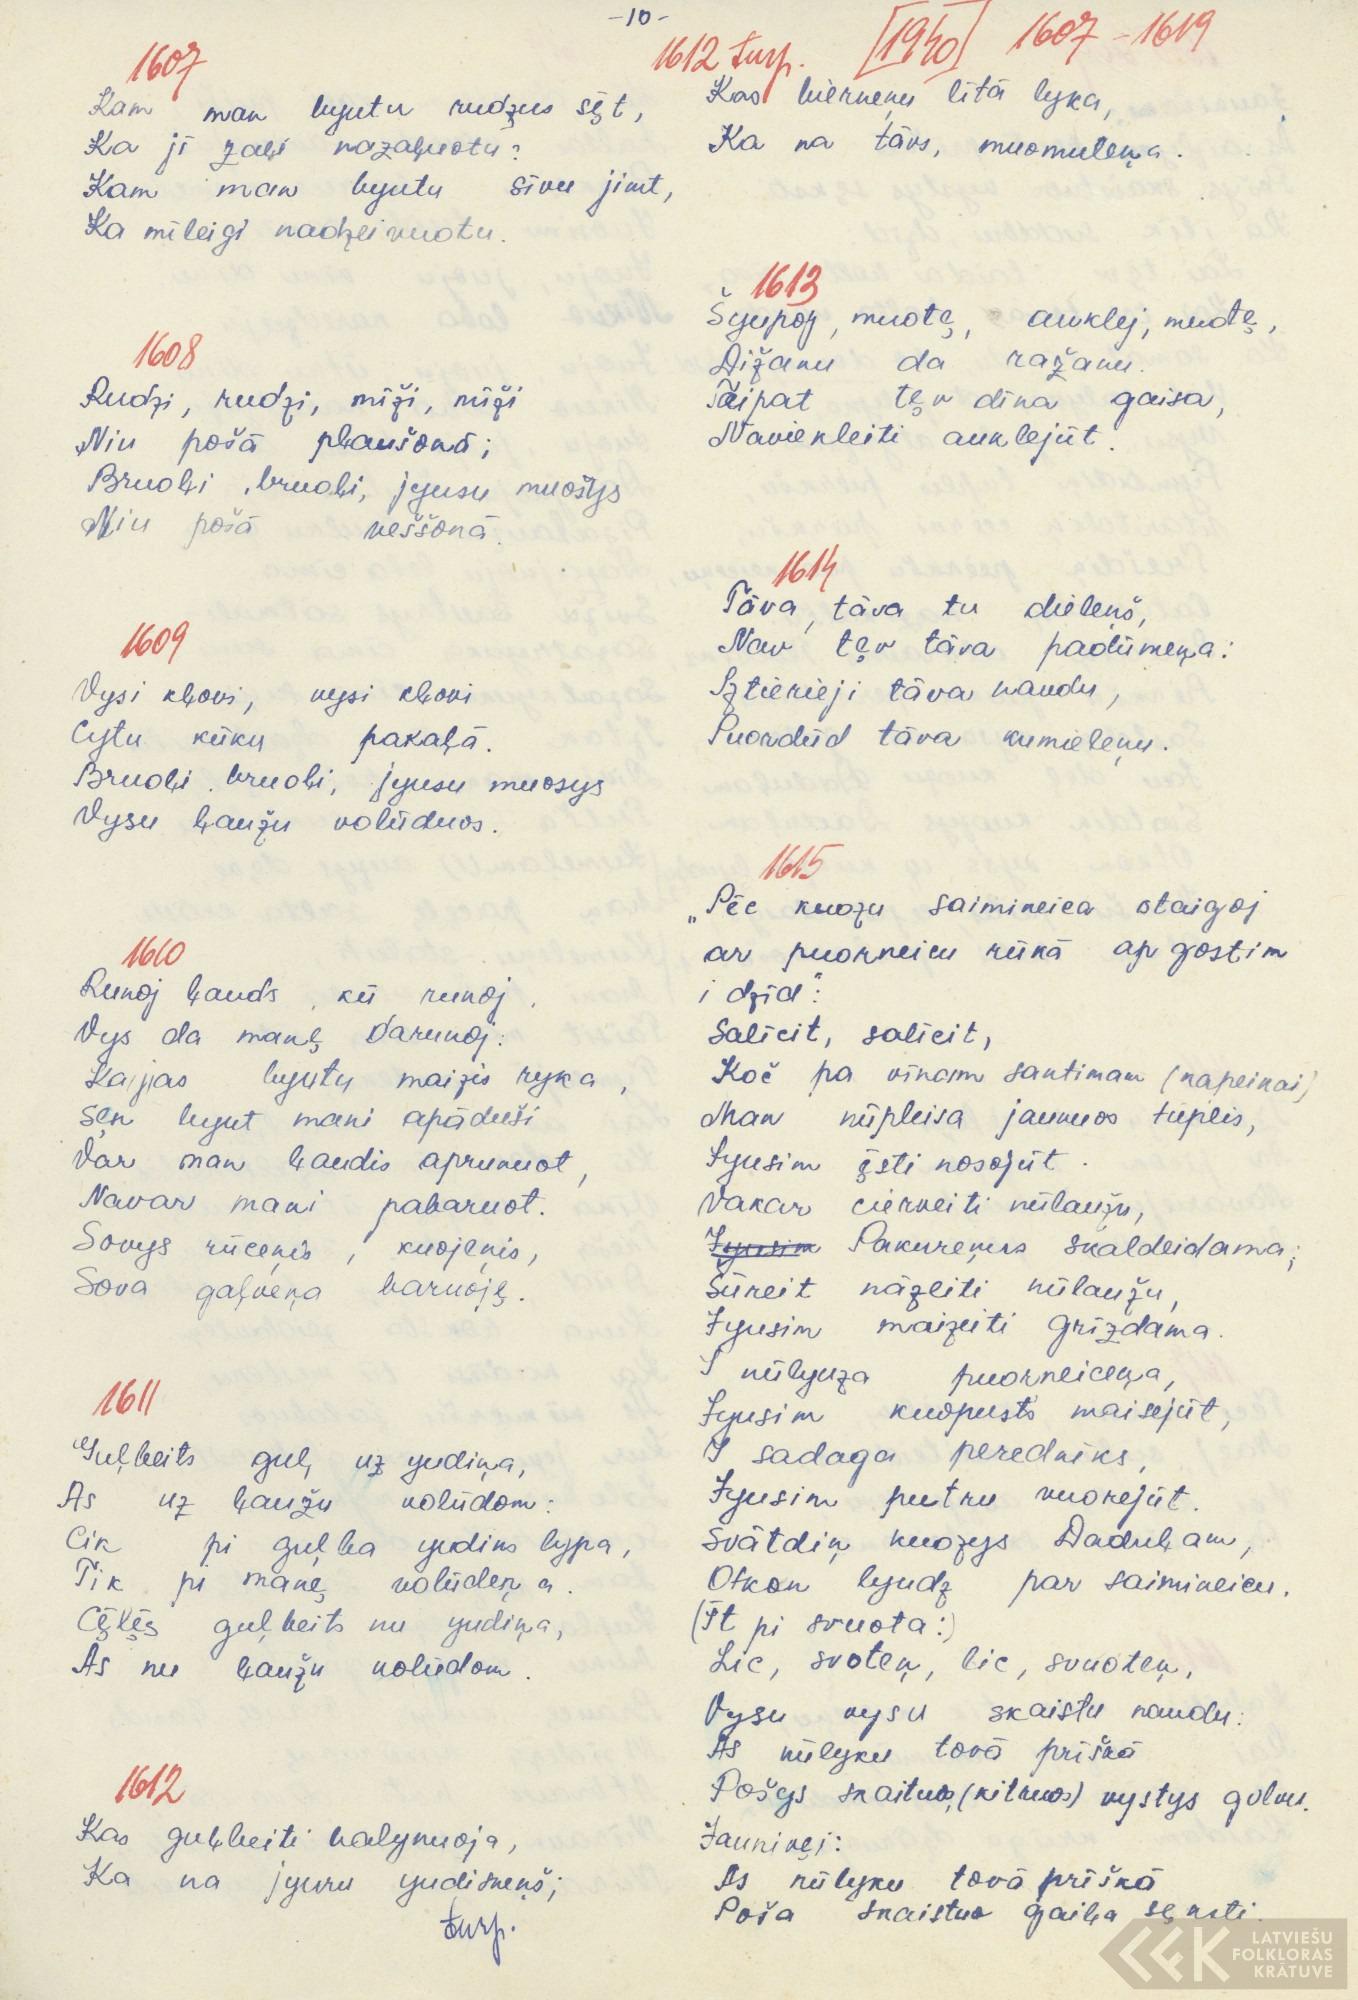 1940-12-zinatniska-ekspedicija-03-0020